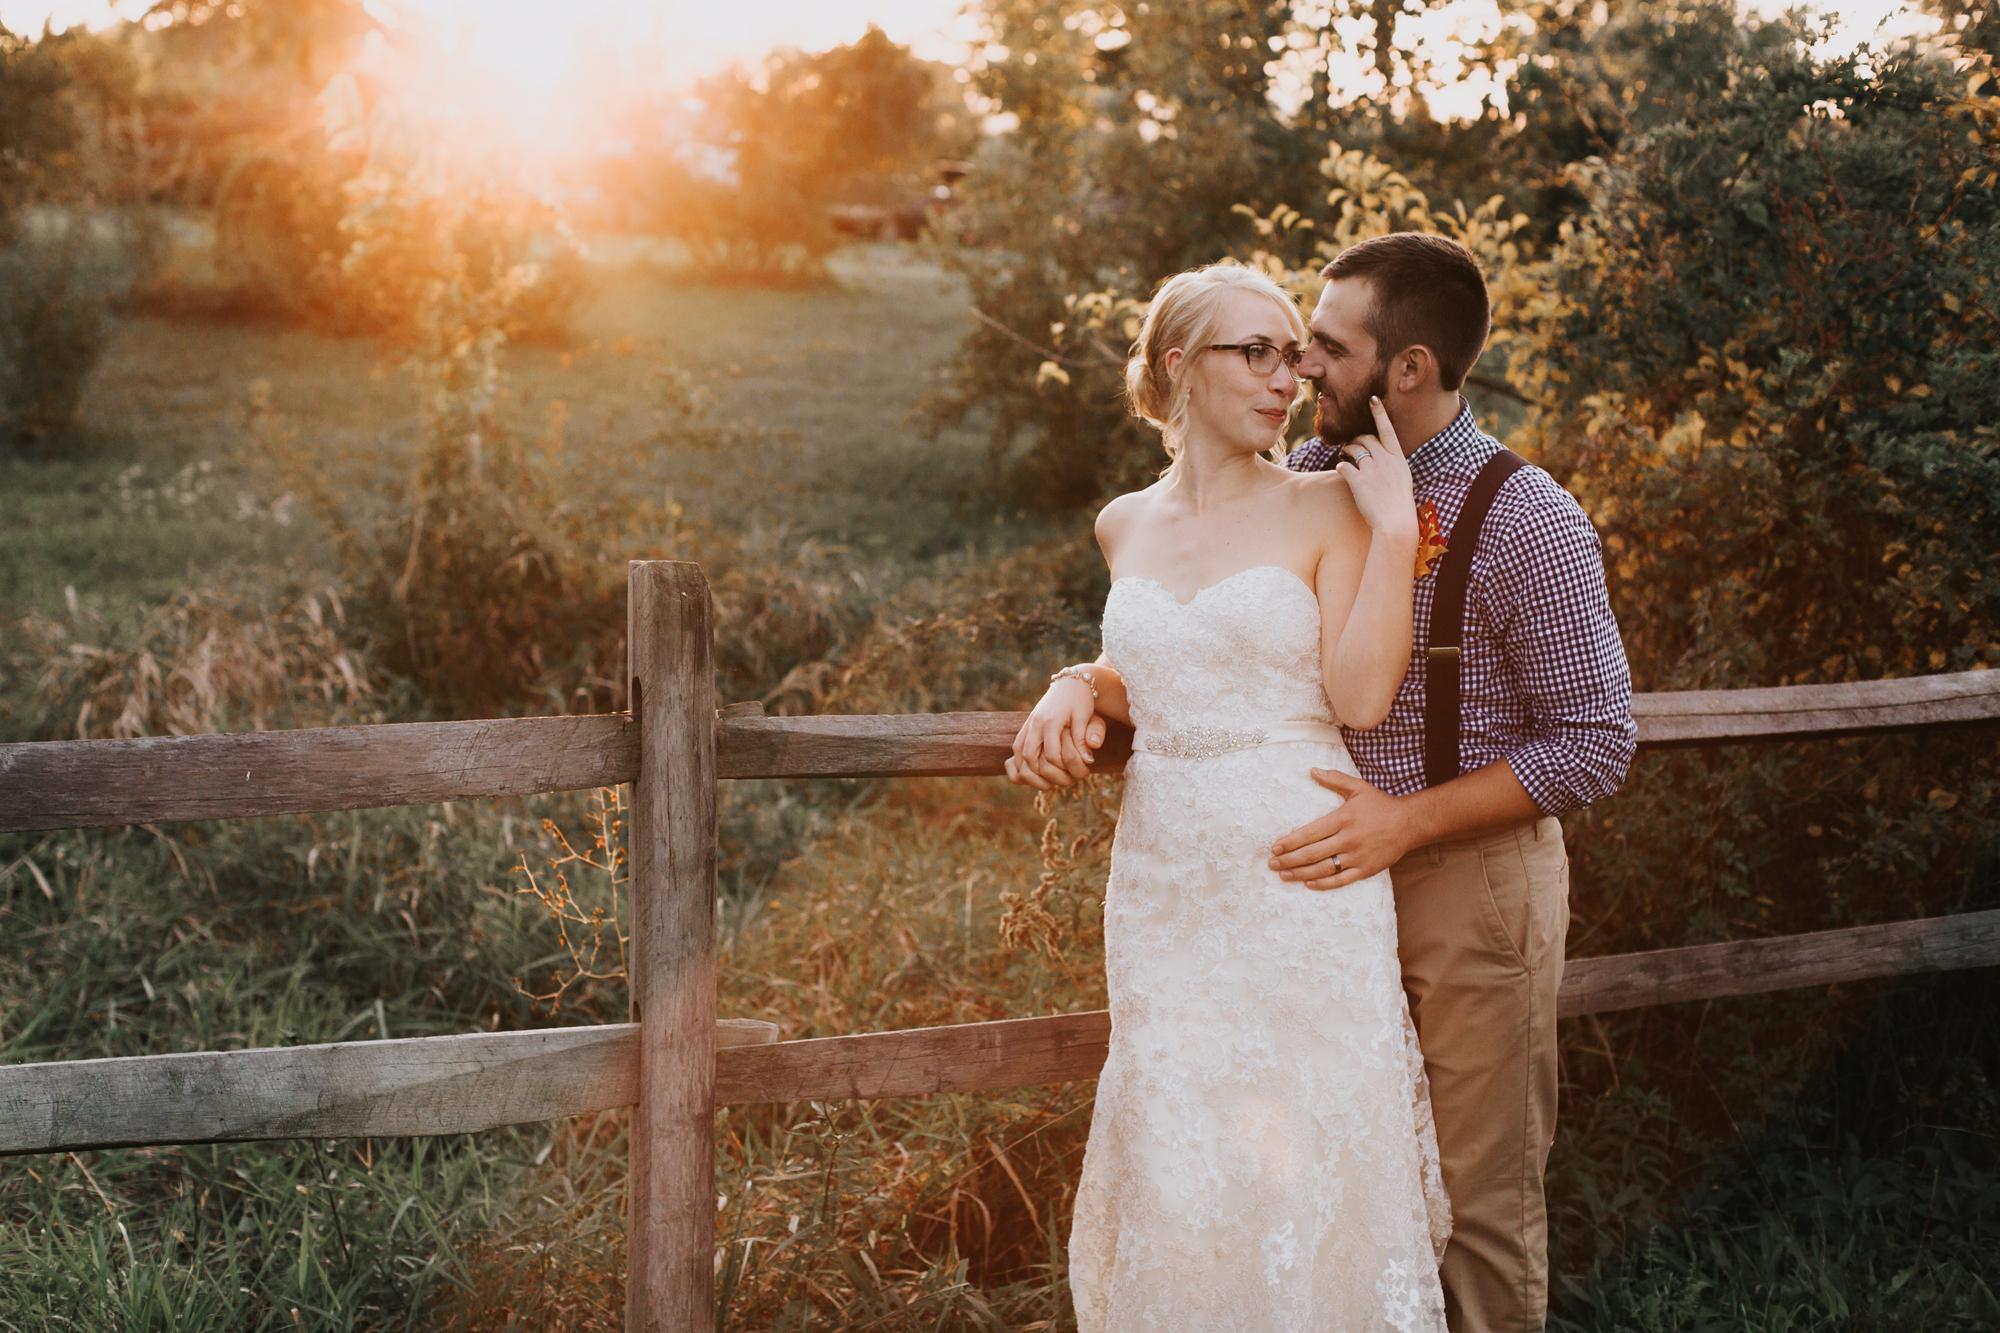 wedding-day-couples-portrait-photography-east-pennsylvania